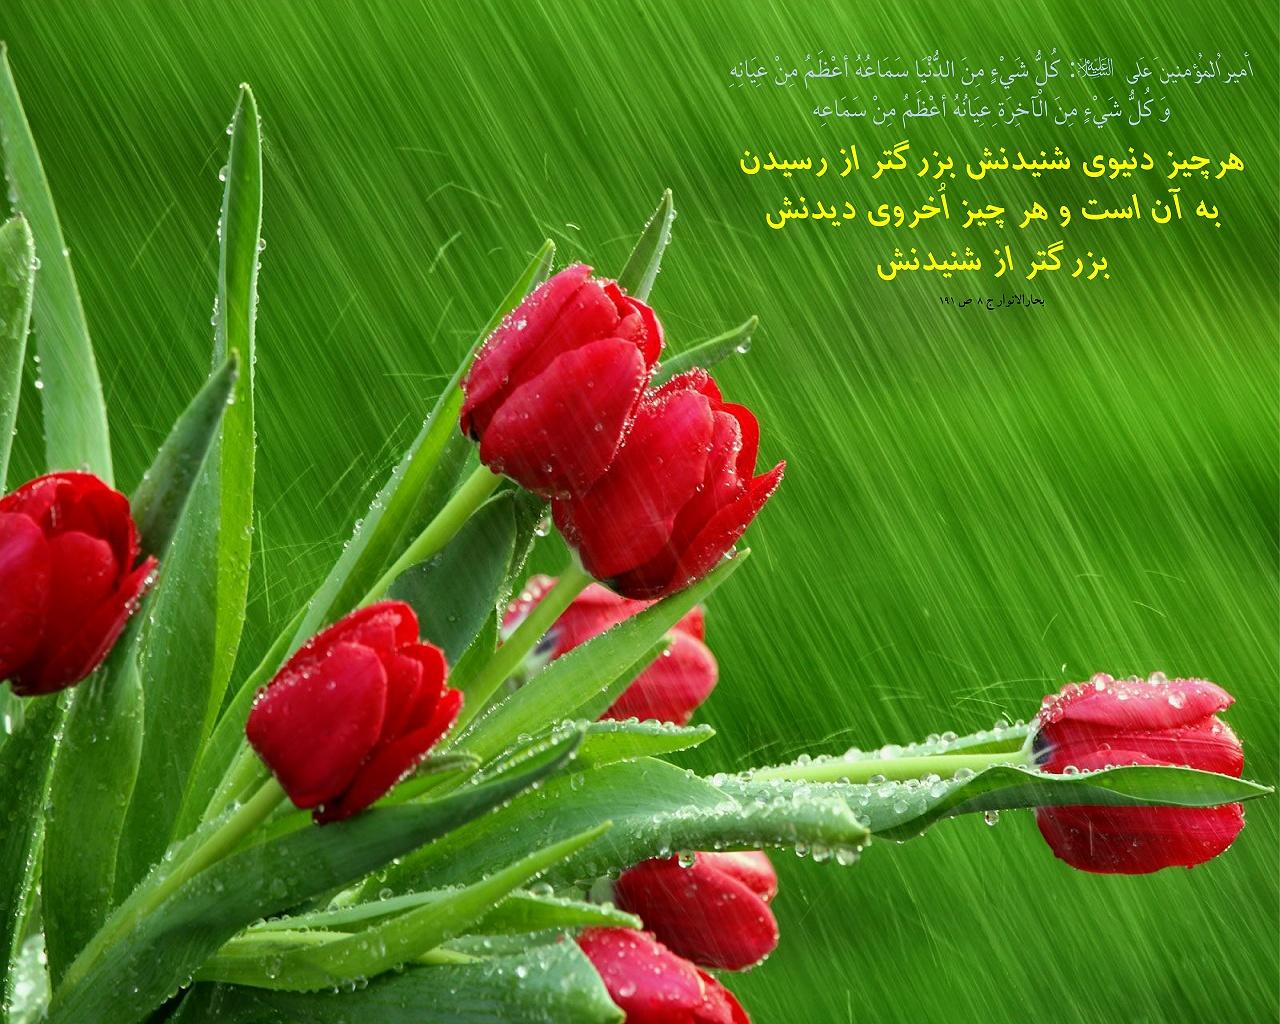 http://naroee92.loxblog.com/upload/n/naroee92/image/Hadis_PO_1-533_Neveshteha_Rast_001-300_HQ_Page_007.jpg